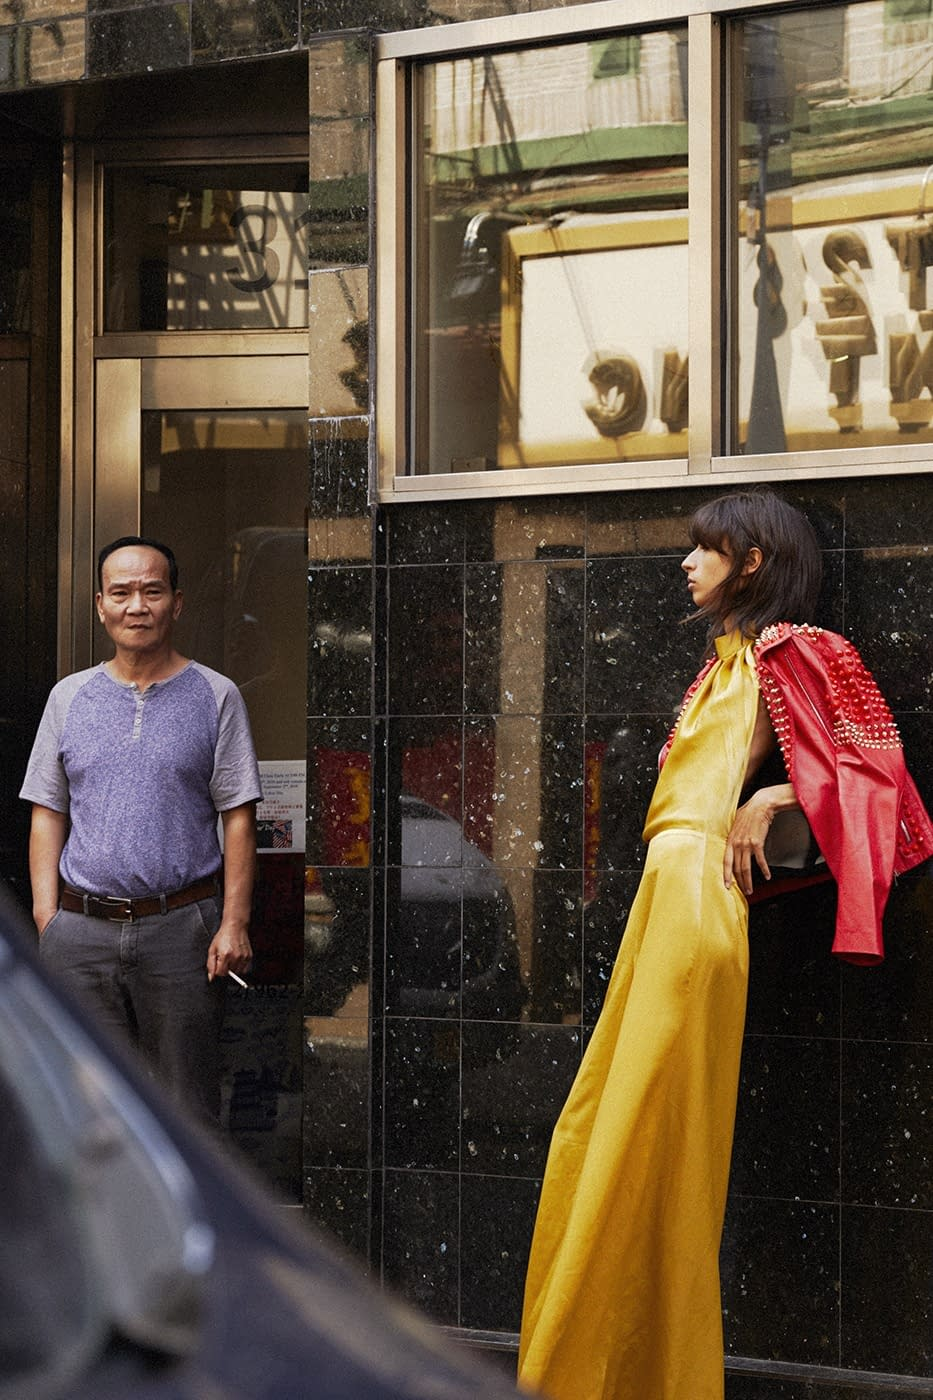 New York Stories 1 photo Enric Galceran - 03